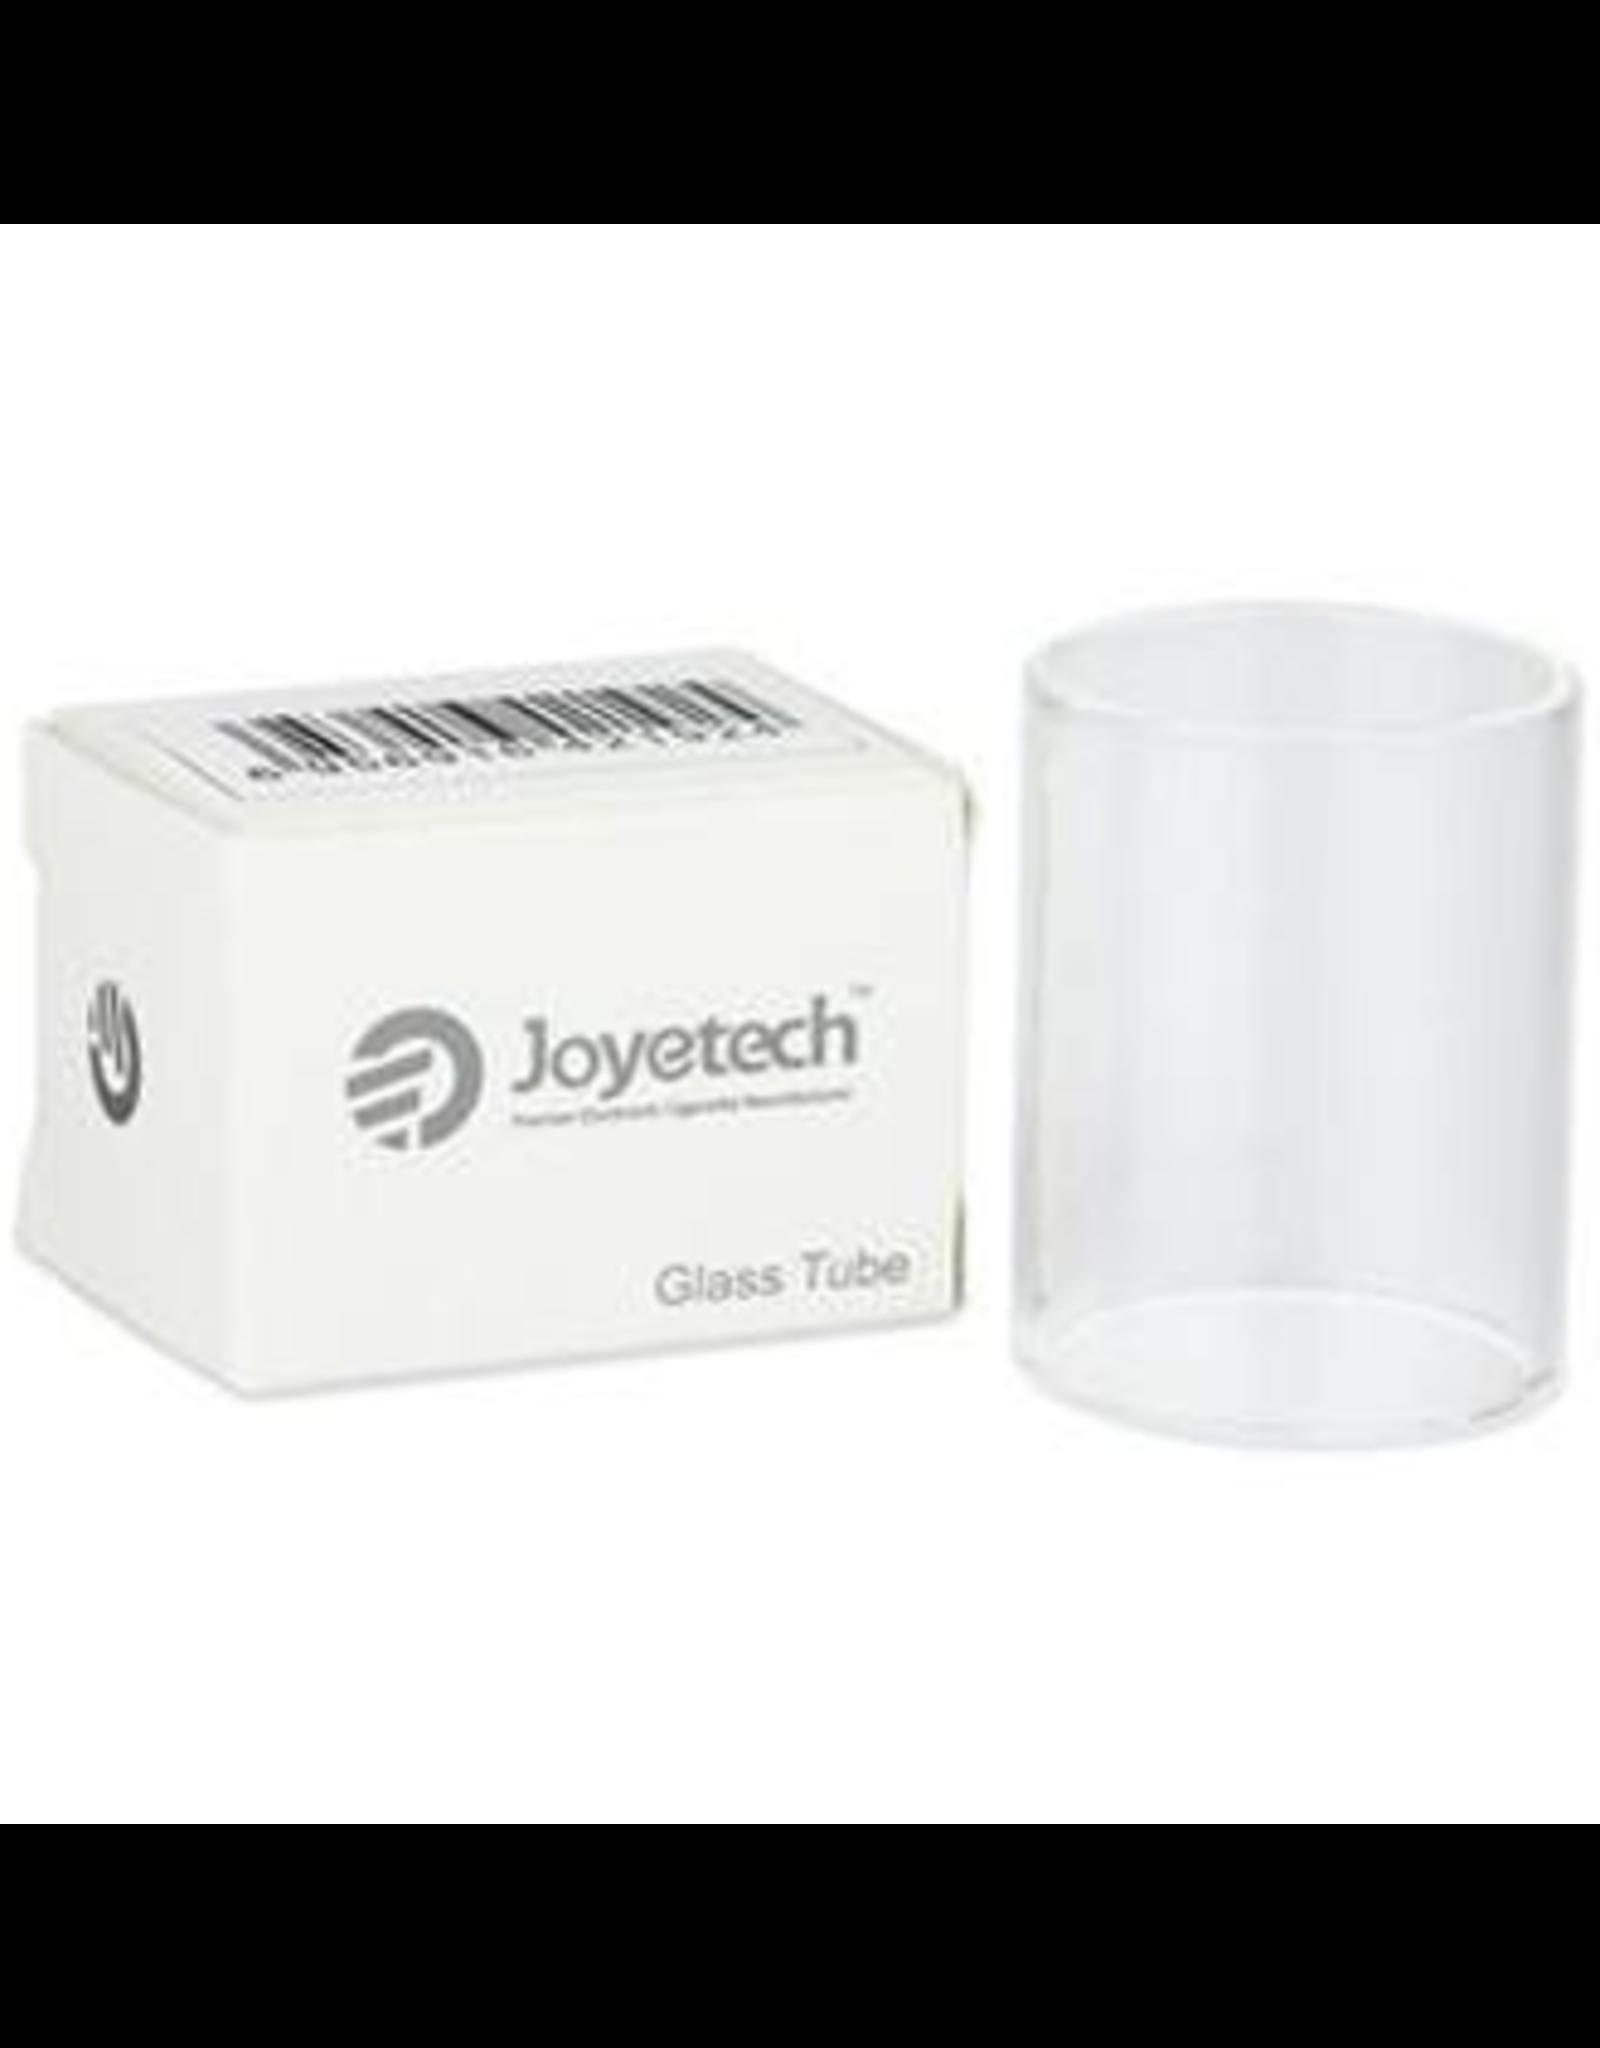 Joyetech Joyetech Replacement Glass